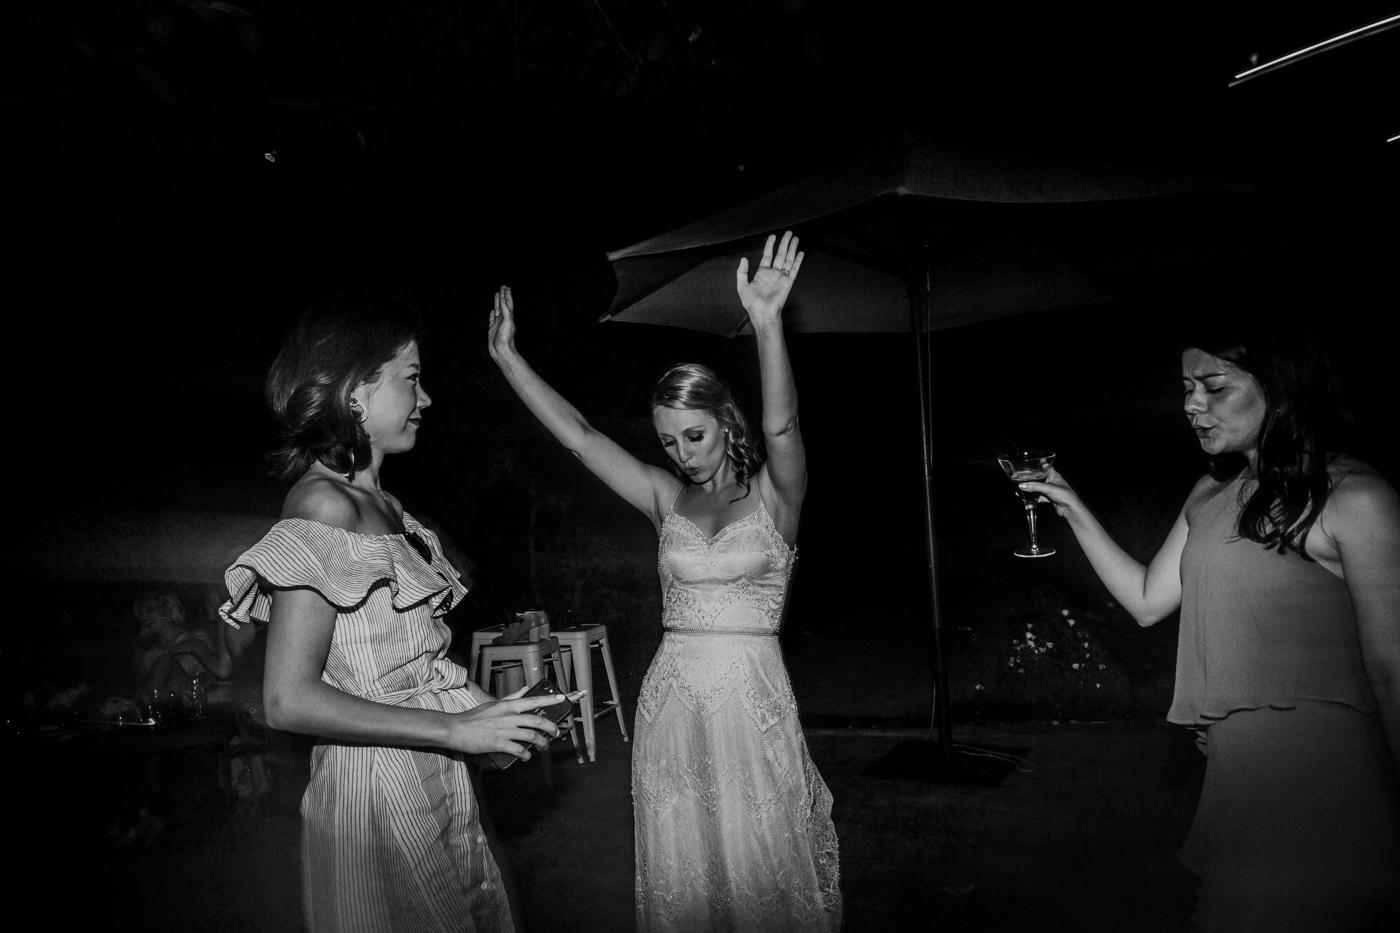 Anthony & Eliet - Wagga Wagga Wedding - Country NSW - Samantha Heather Photography-180.jpg